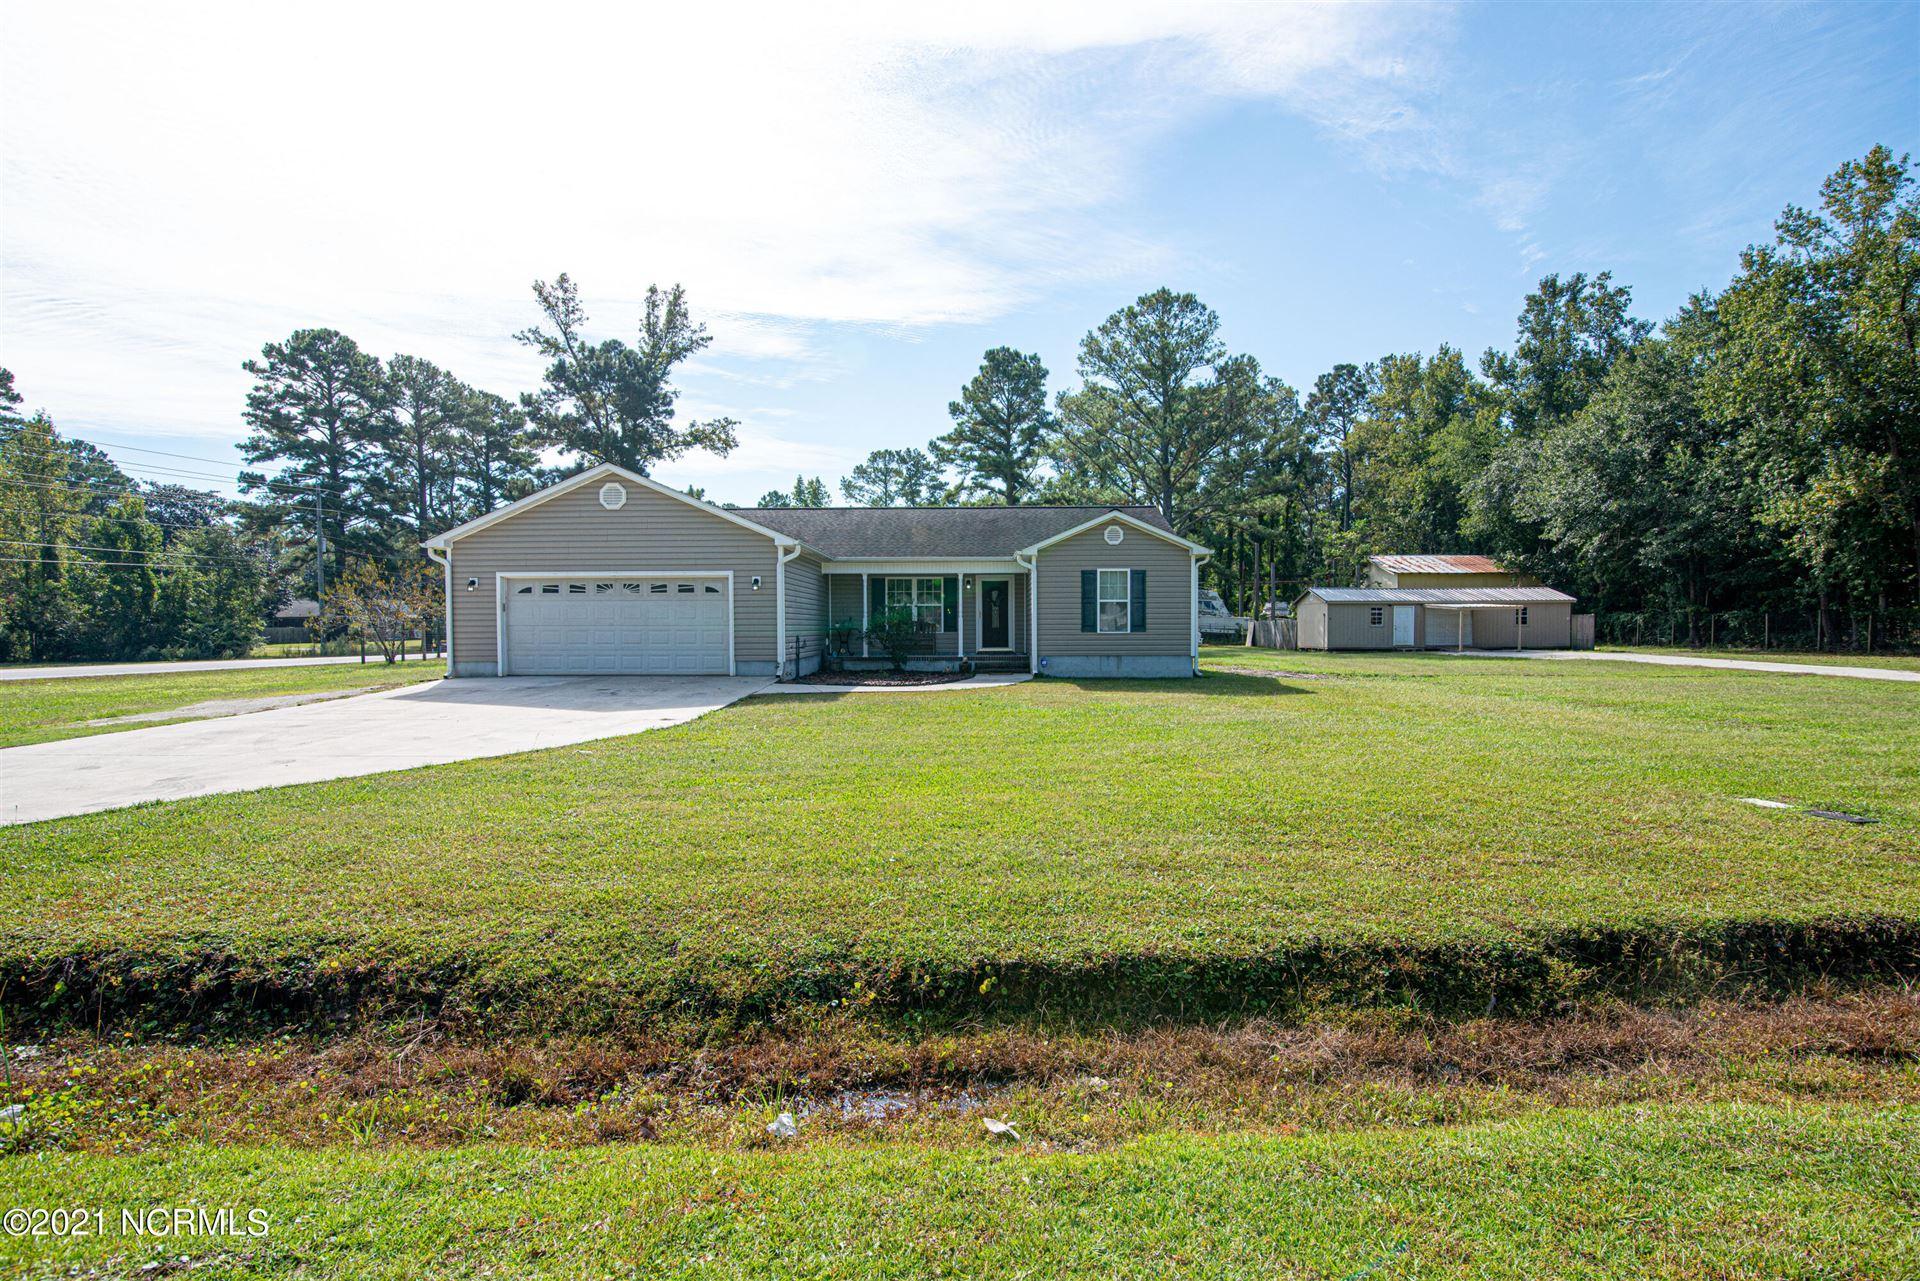 Photo of 103 Silence Road, Jacksonville, NC 28540 (MLS # 100295484)